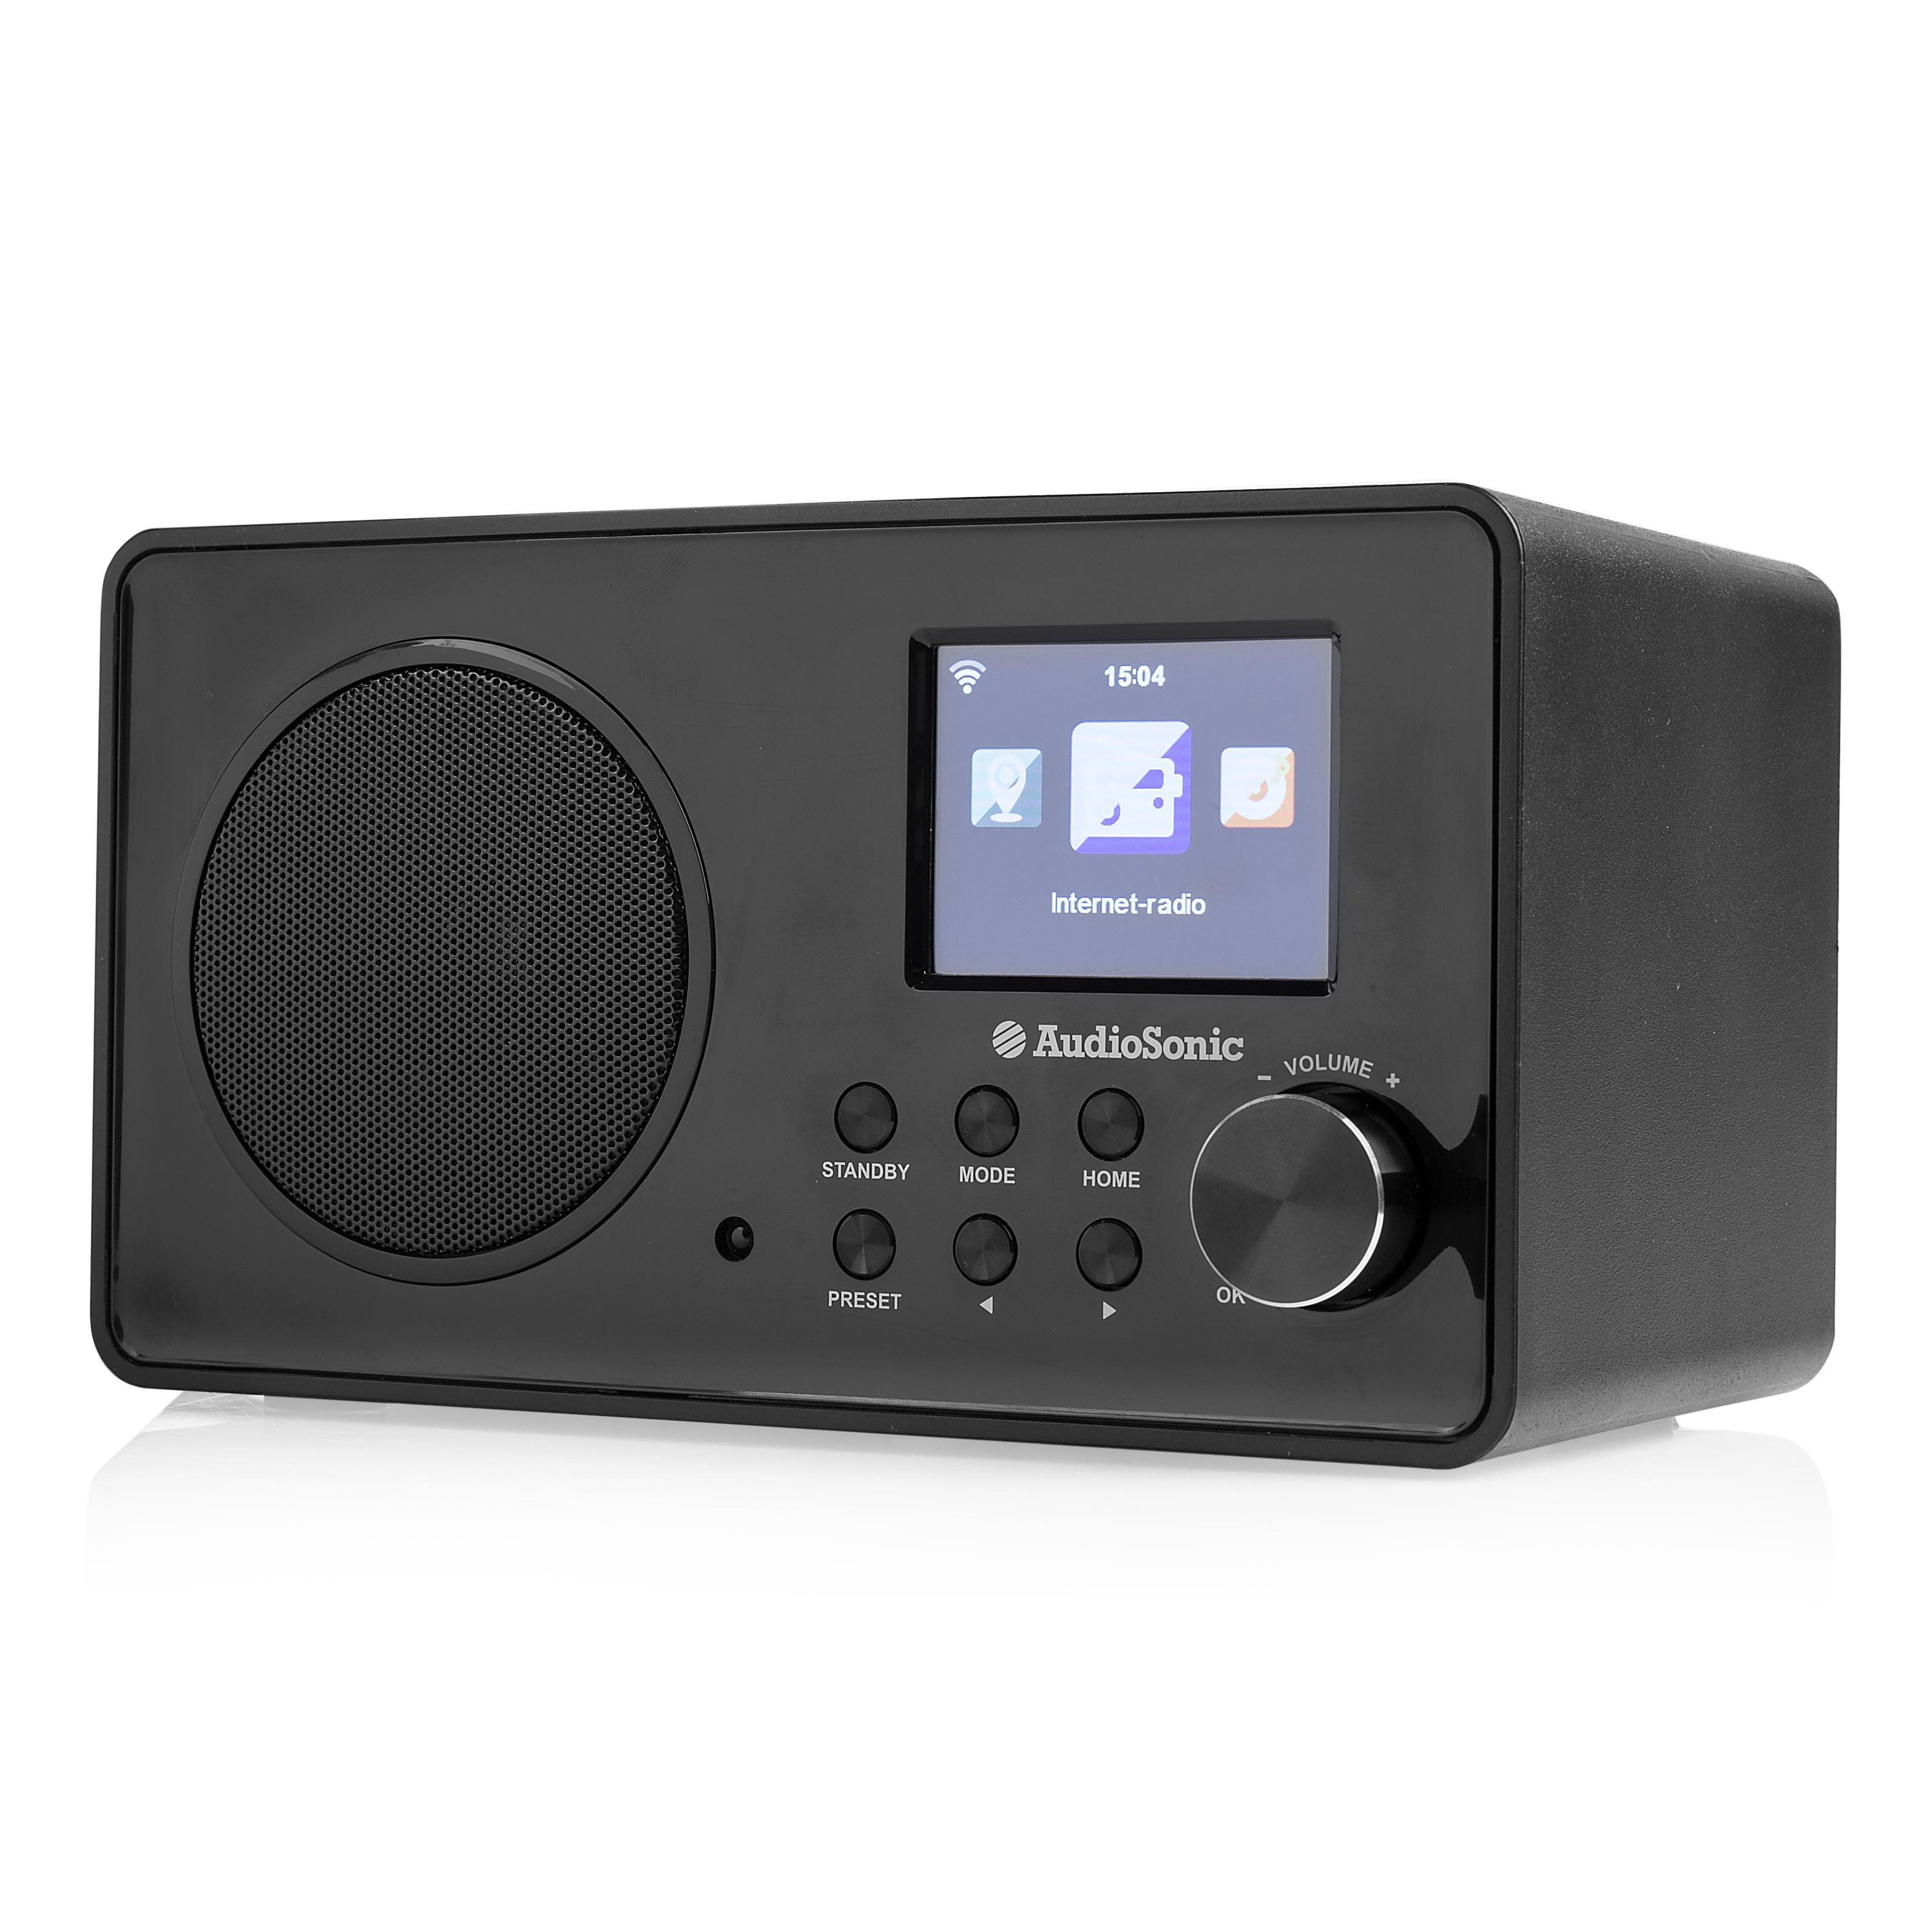 Radio Salle De Bain Wifi ~ audiosonic rd 8520 radio radio r veil amazon fr tv vid o